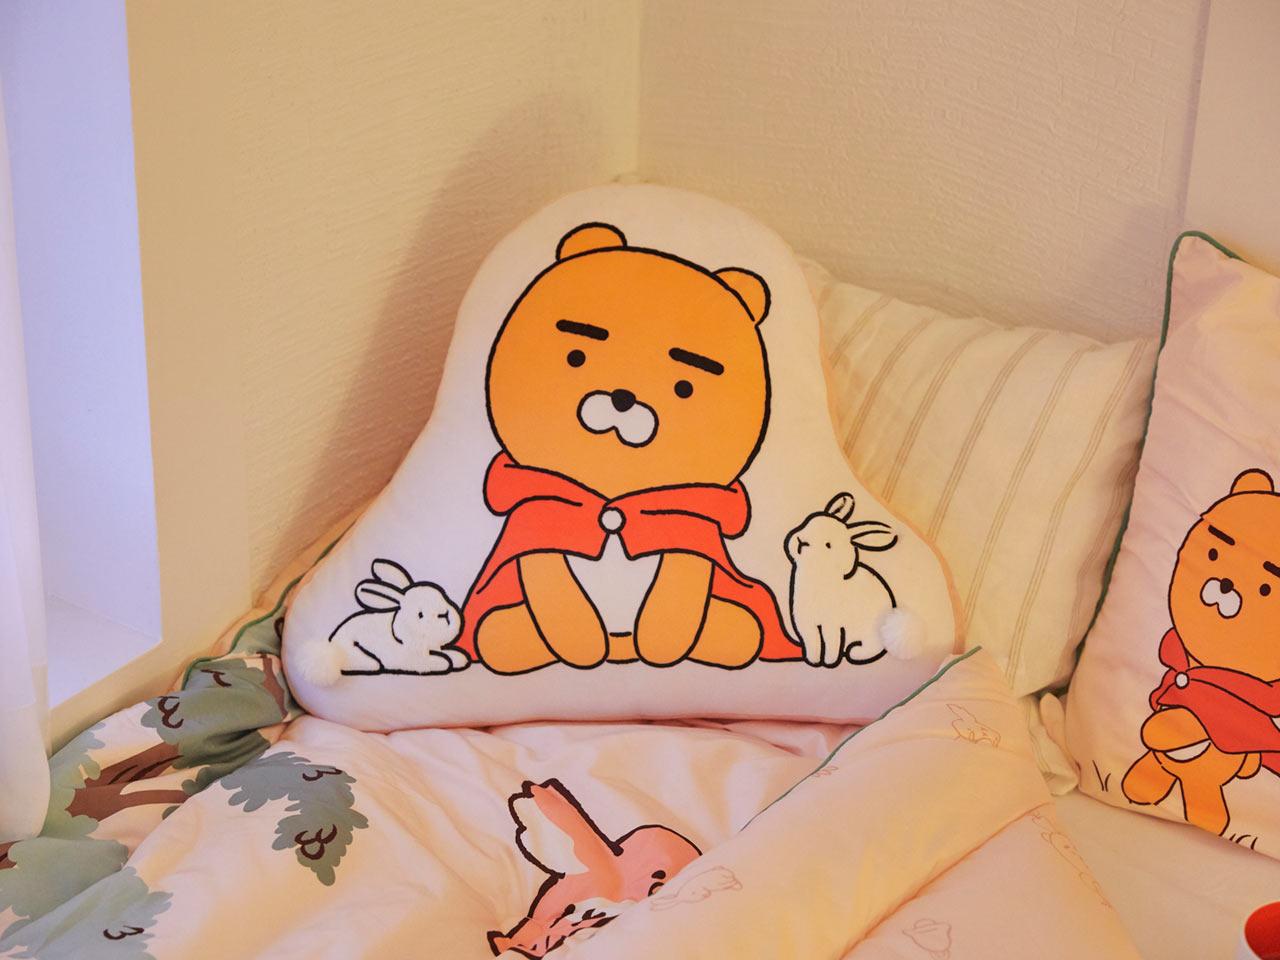 Kakao Friends ryan攬枕